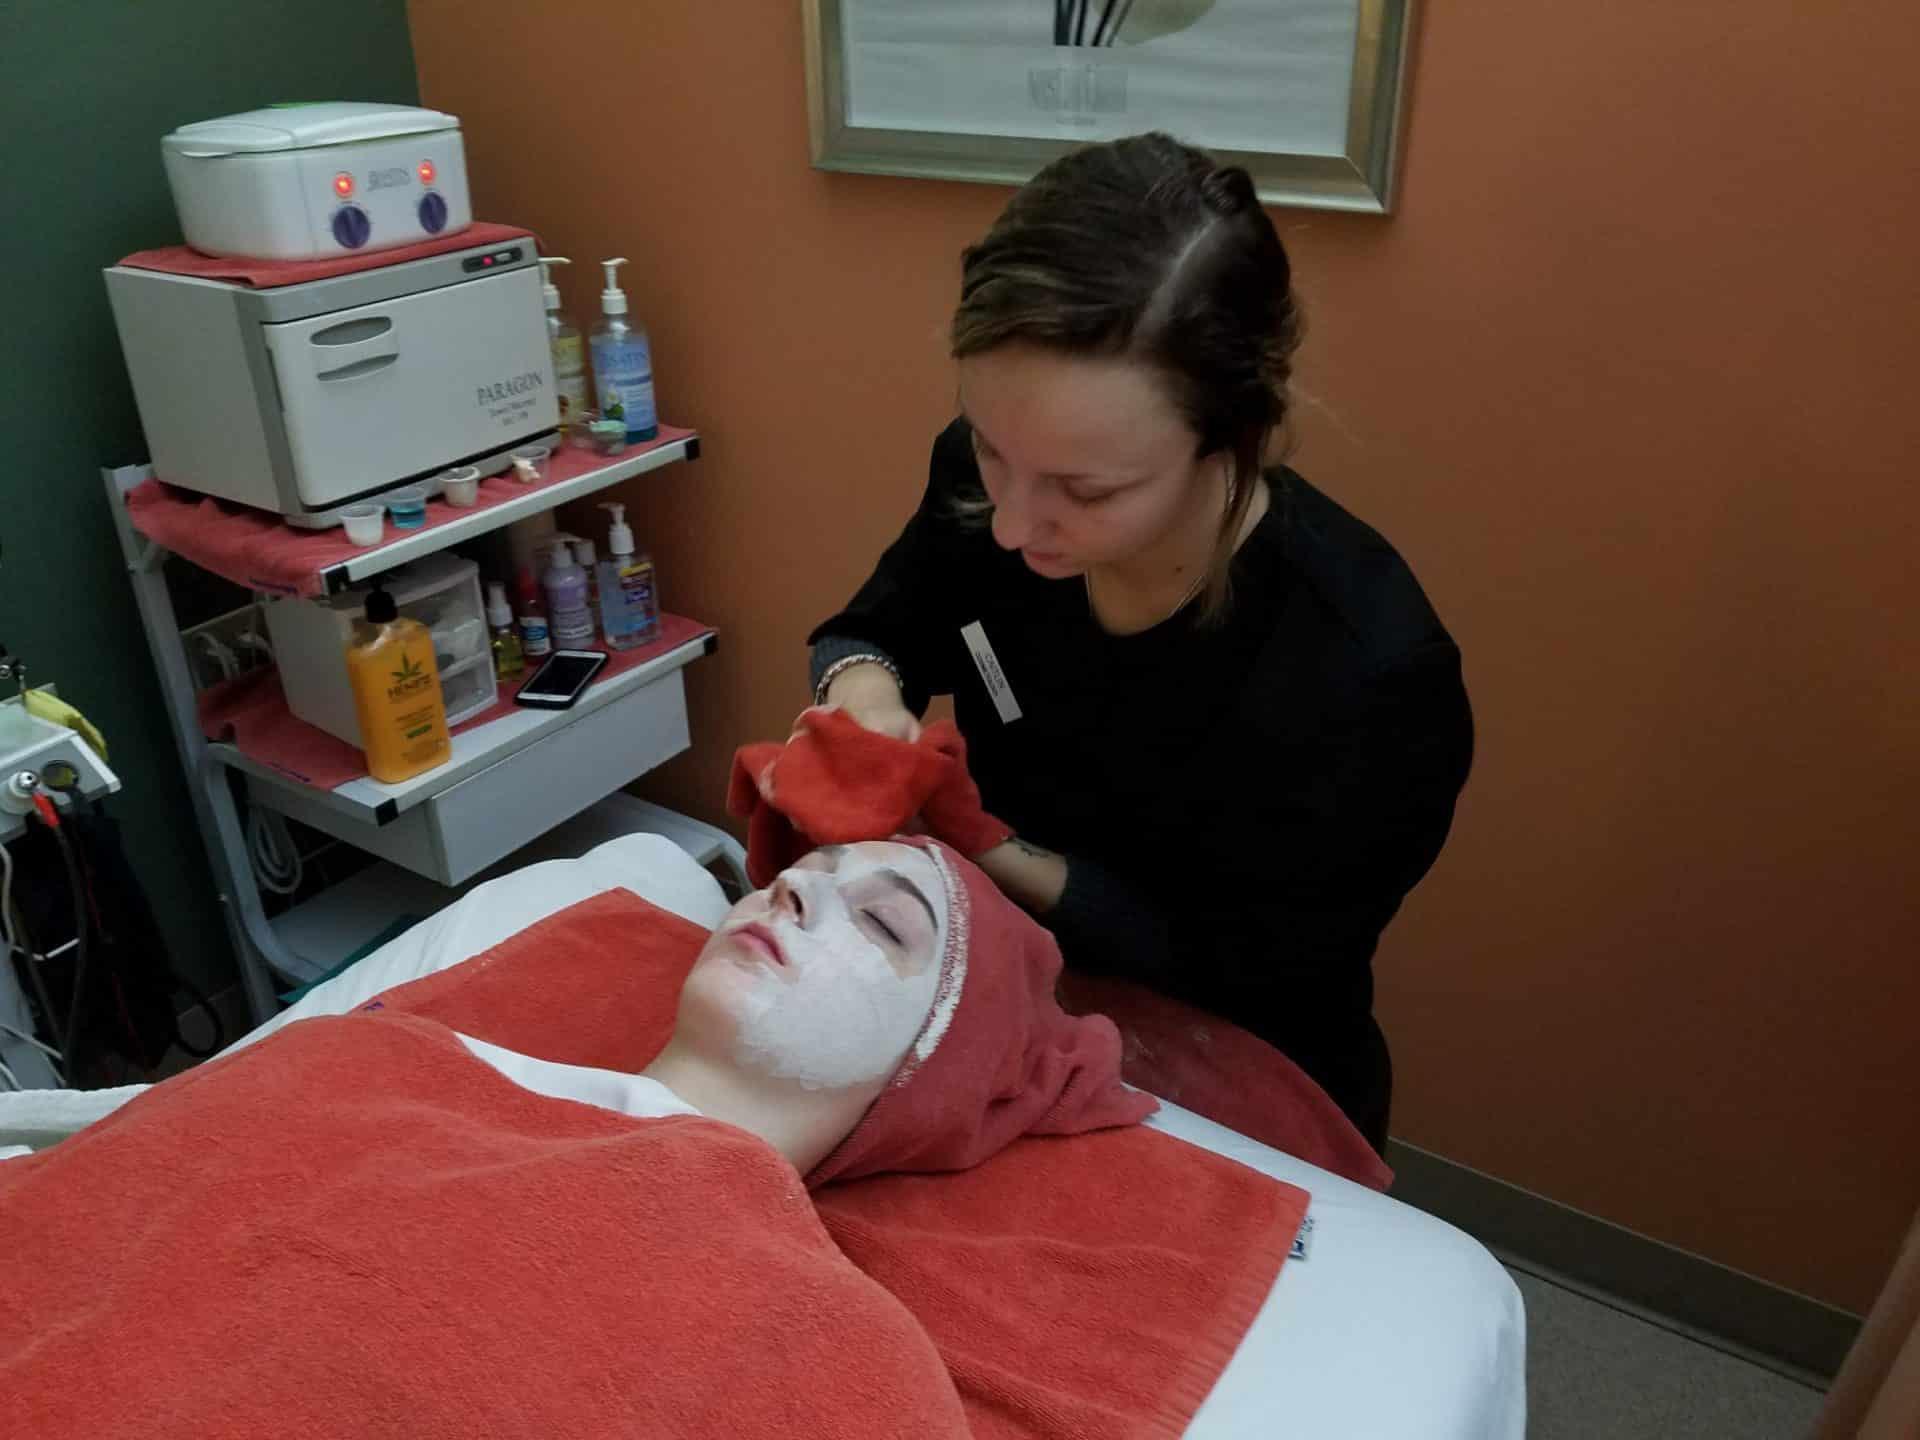 Cosmo student giving a client a facial service